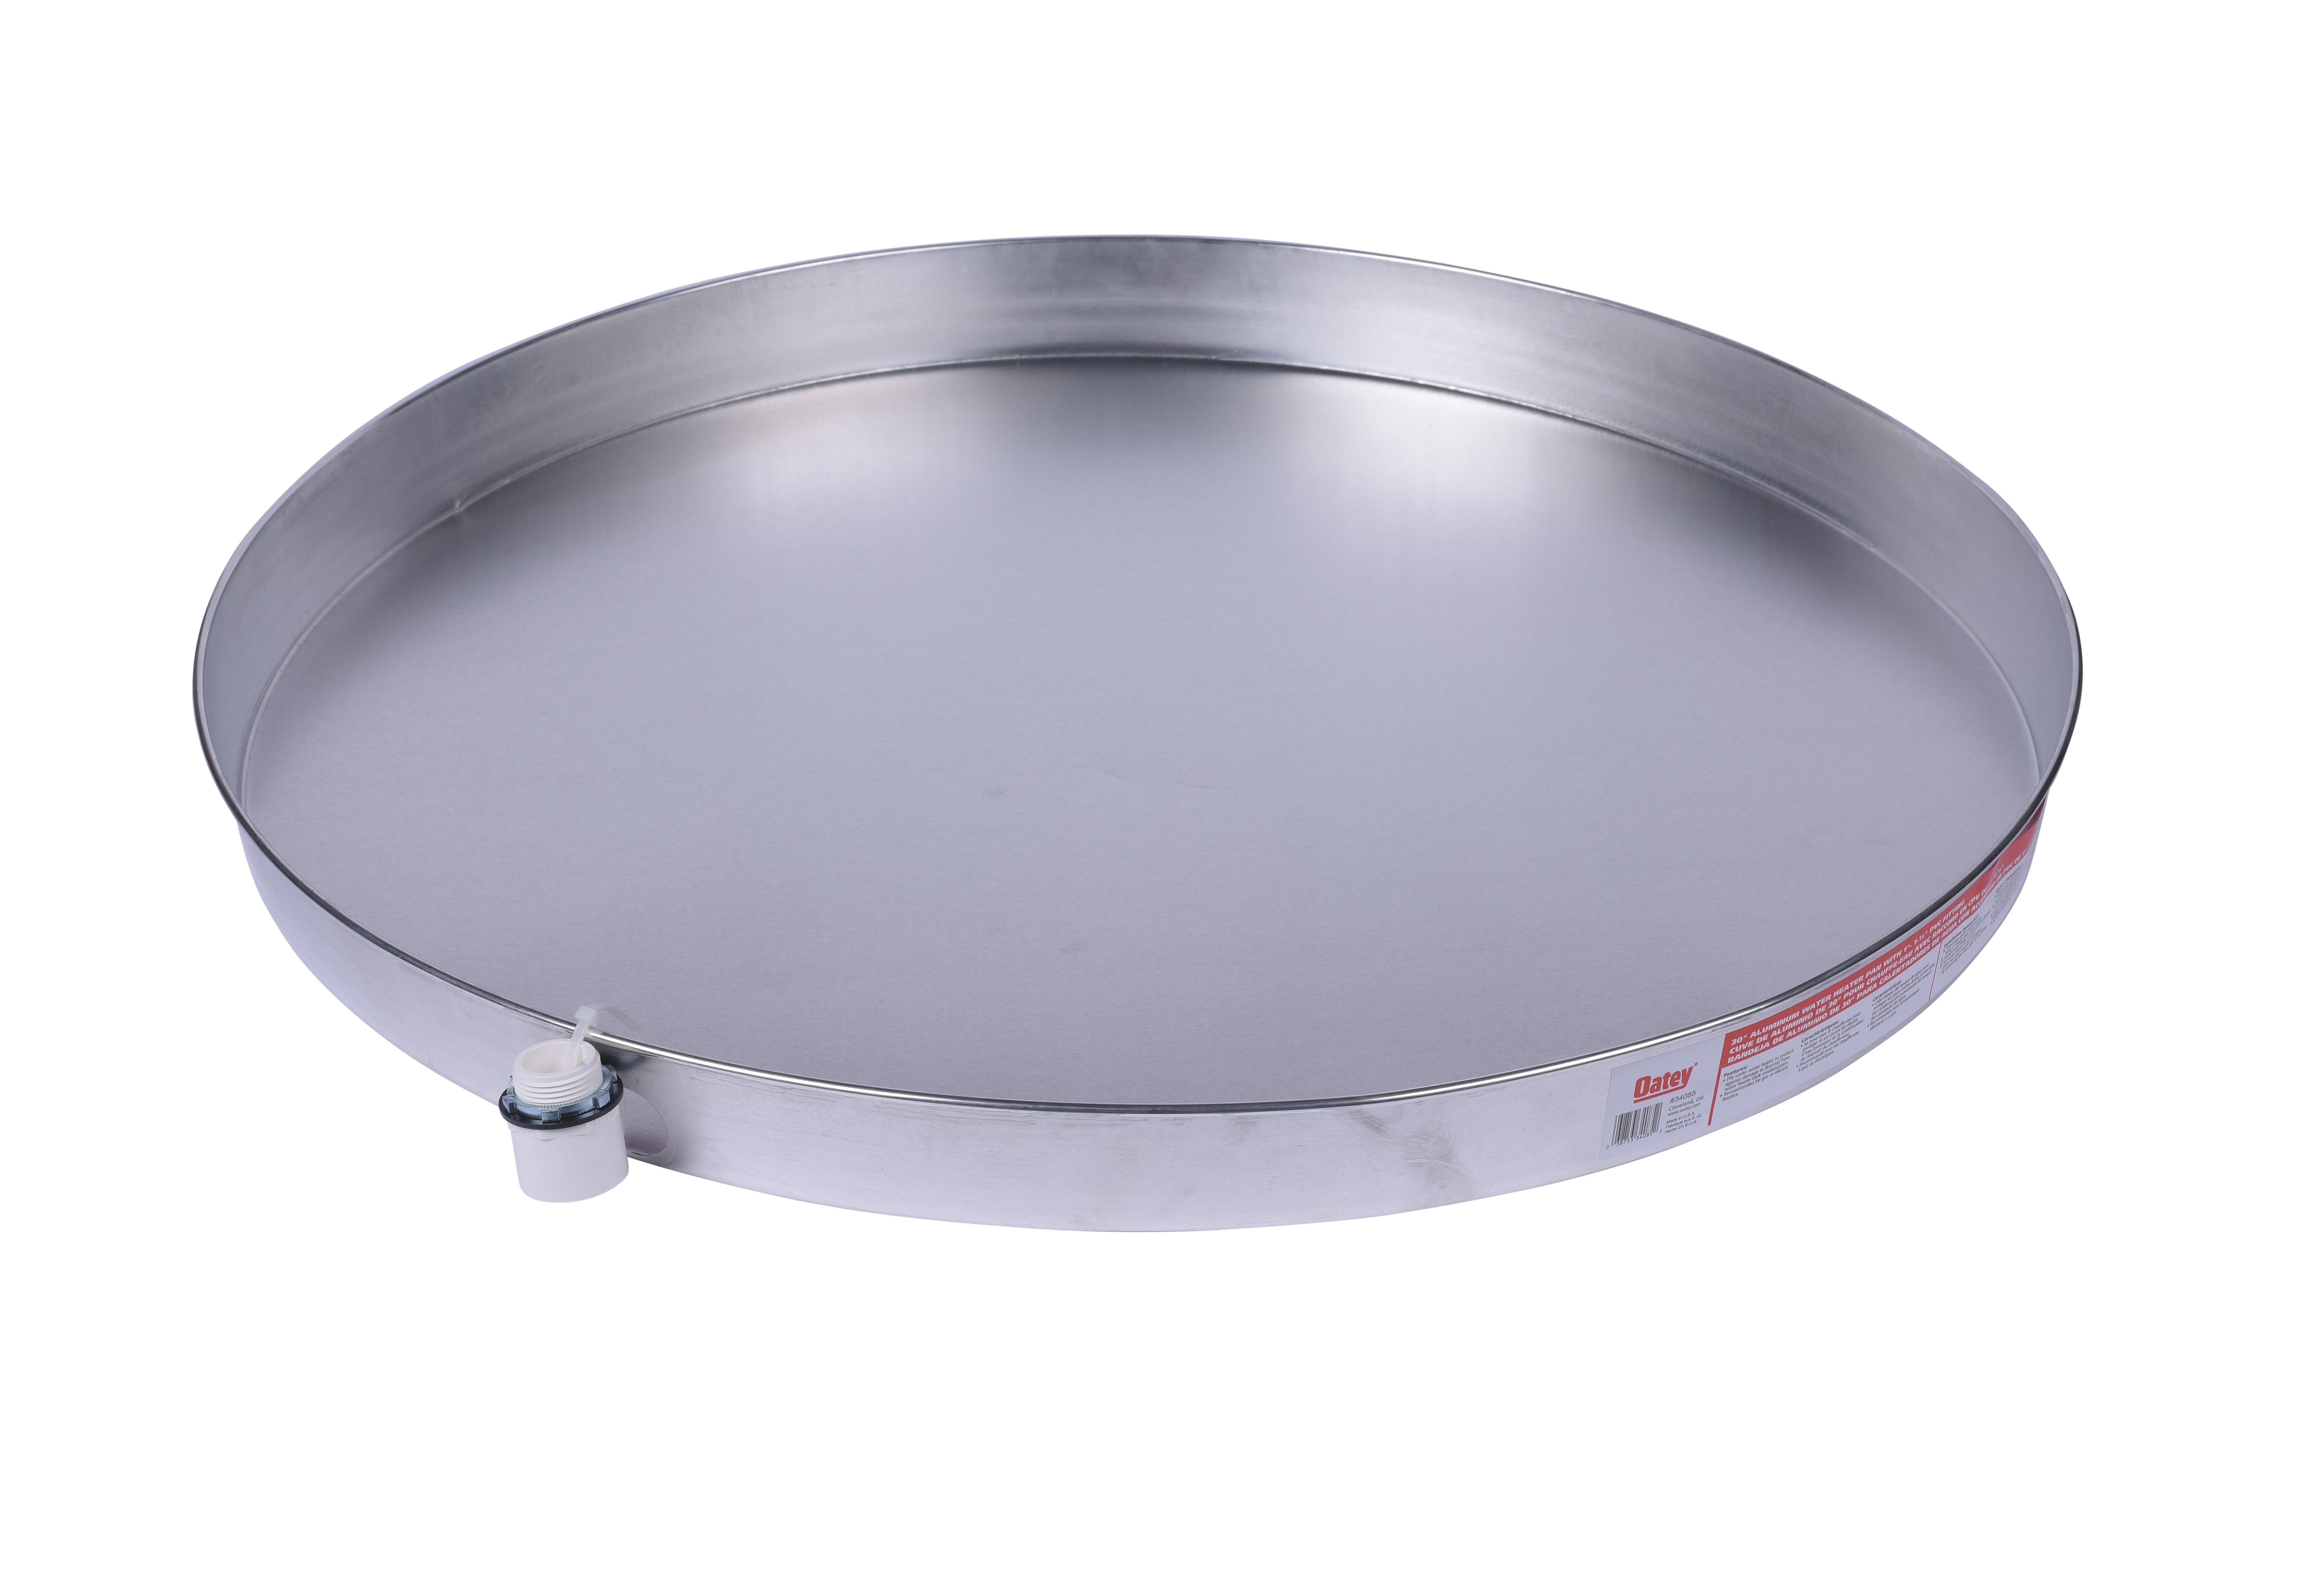 Oatey 30 In. Aluminun Water Heater Pan With 1 In. Adapter 454098